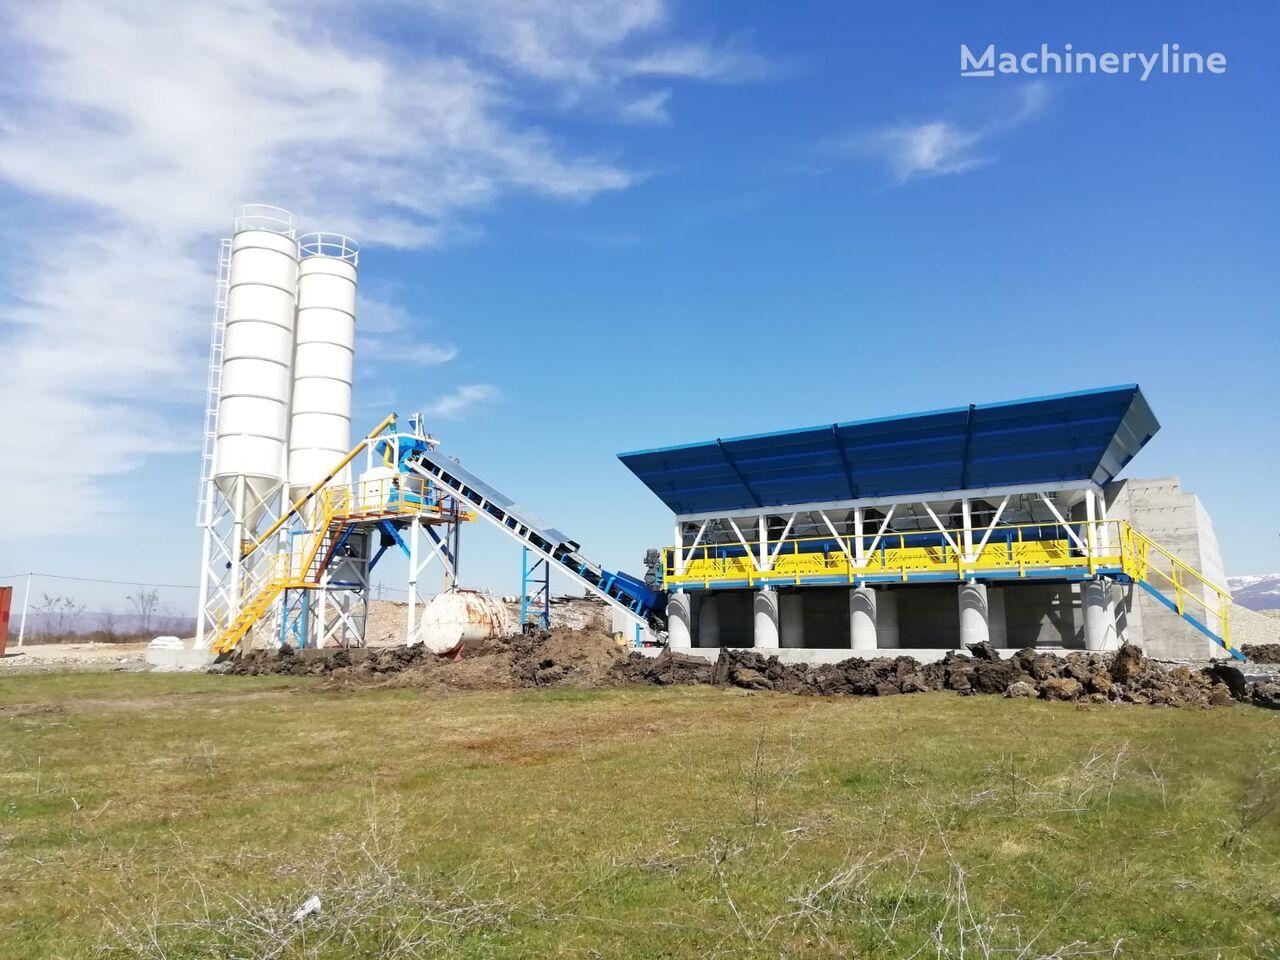 pabrik beton PROMAX Compact Concrete Batching Plant C60-SNG-LINE (60m3/h) baru